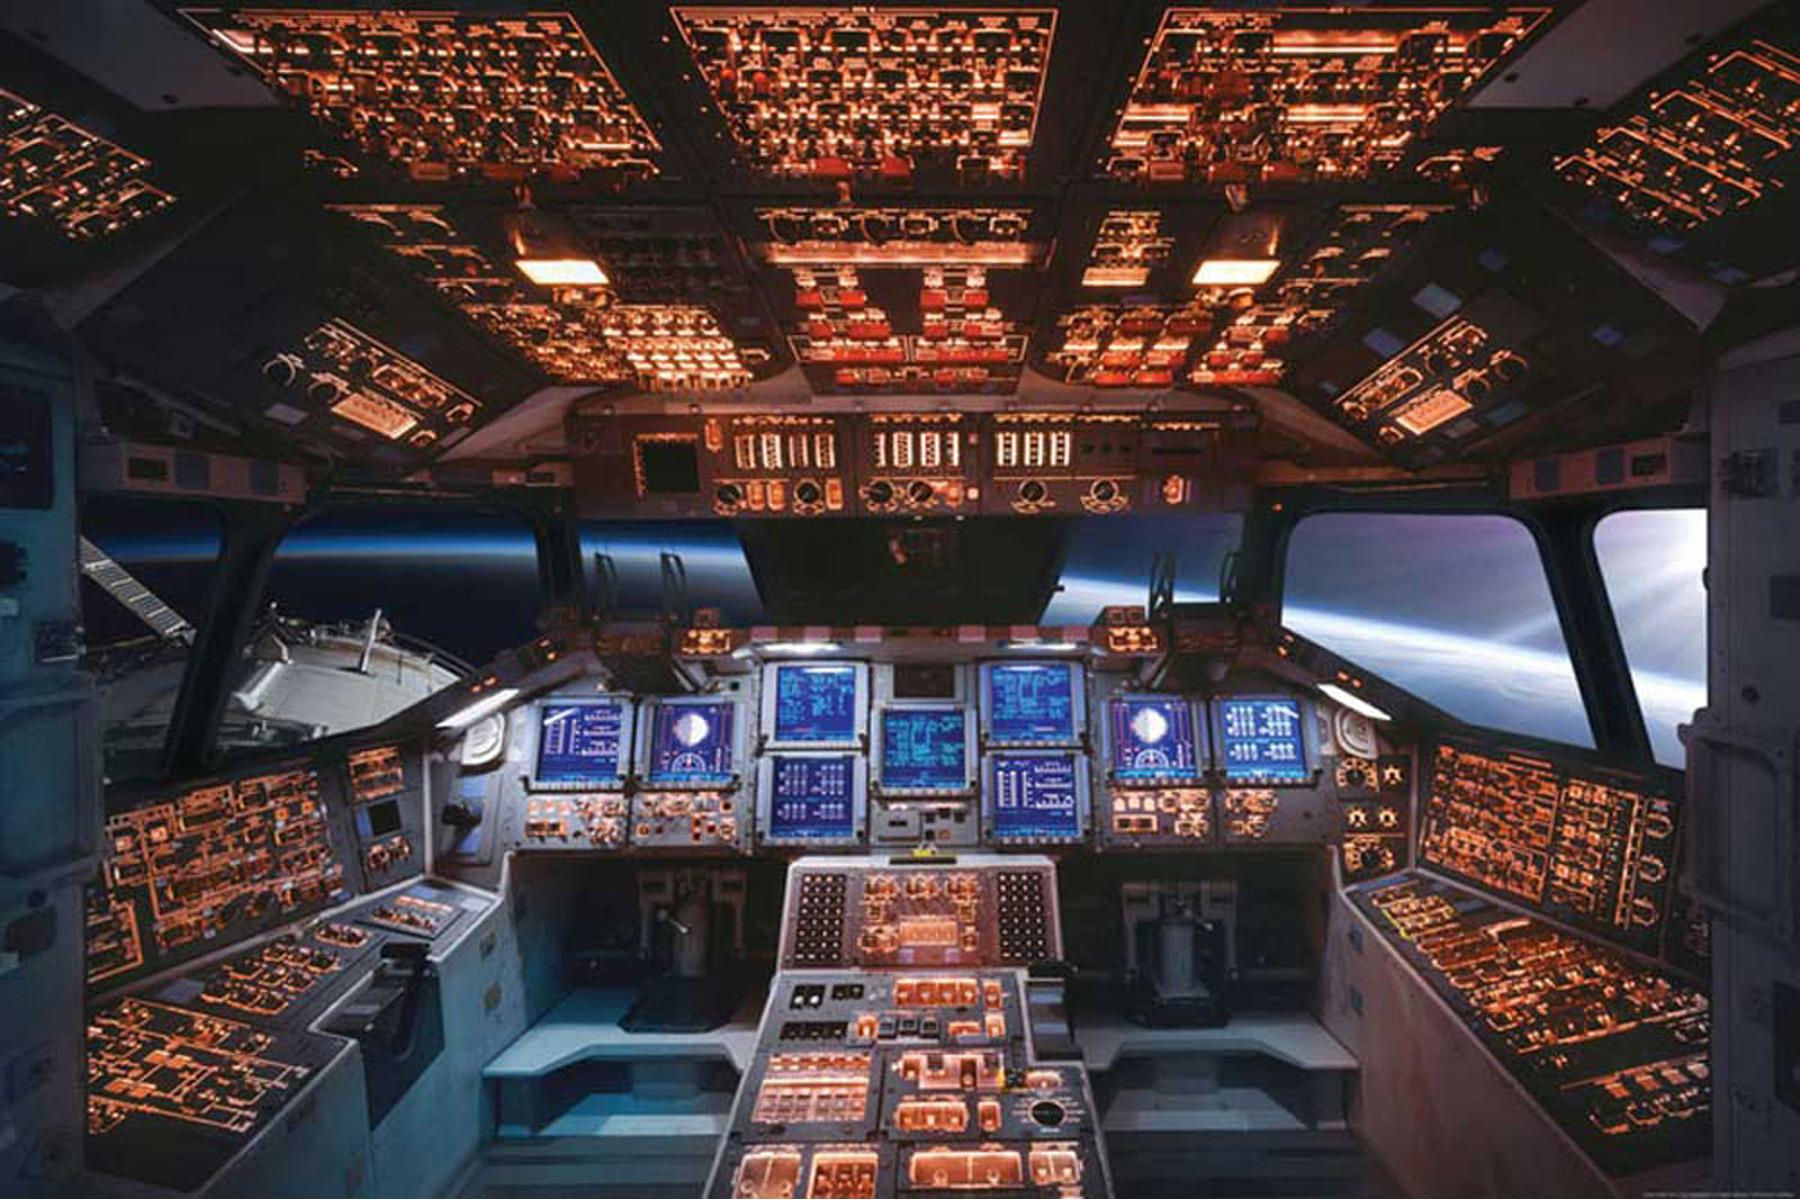 Space Shuttle Instrument Panel : Educational bildung space shuttle cockpit columbia